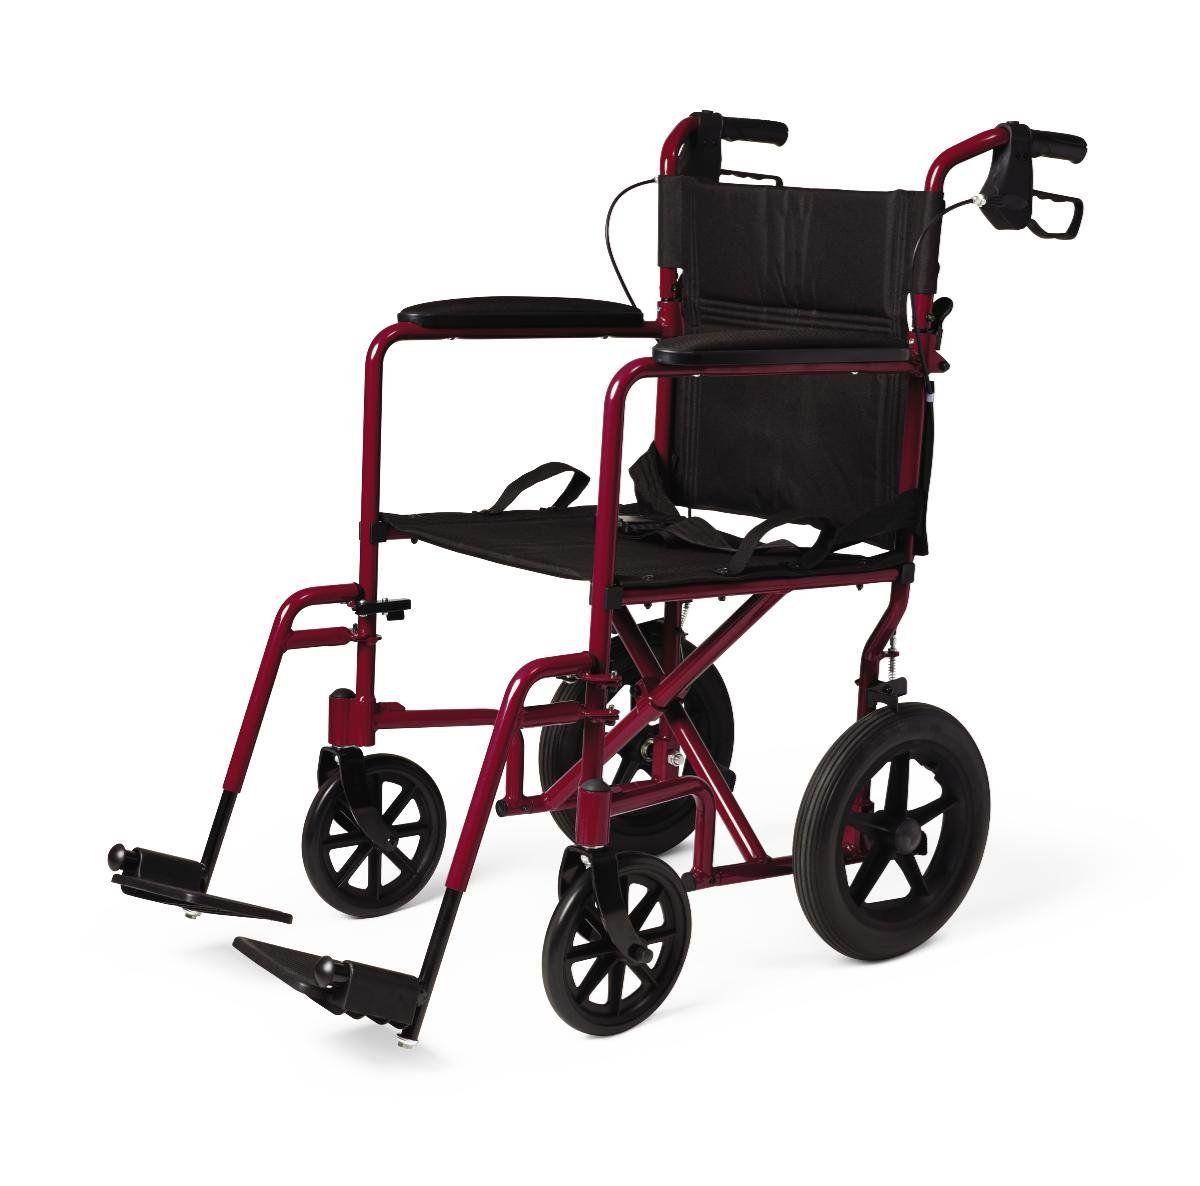 Amazon 122 22 Medline Transport Wheelchair With Brakes